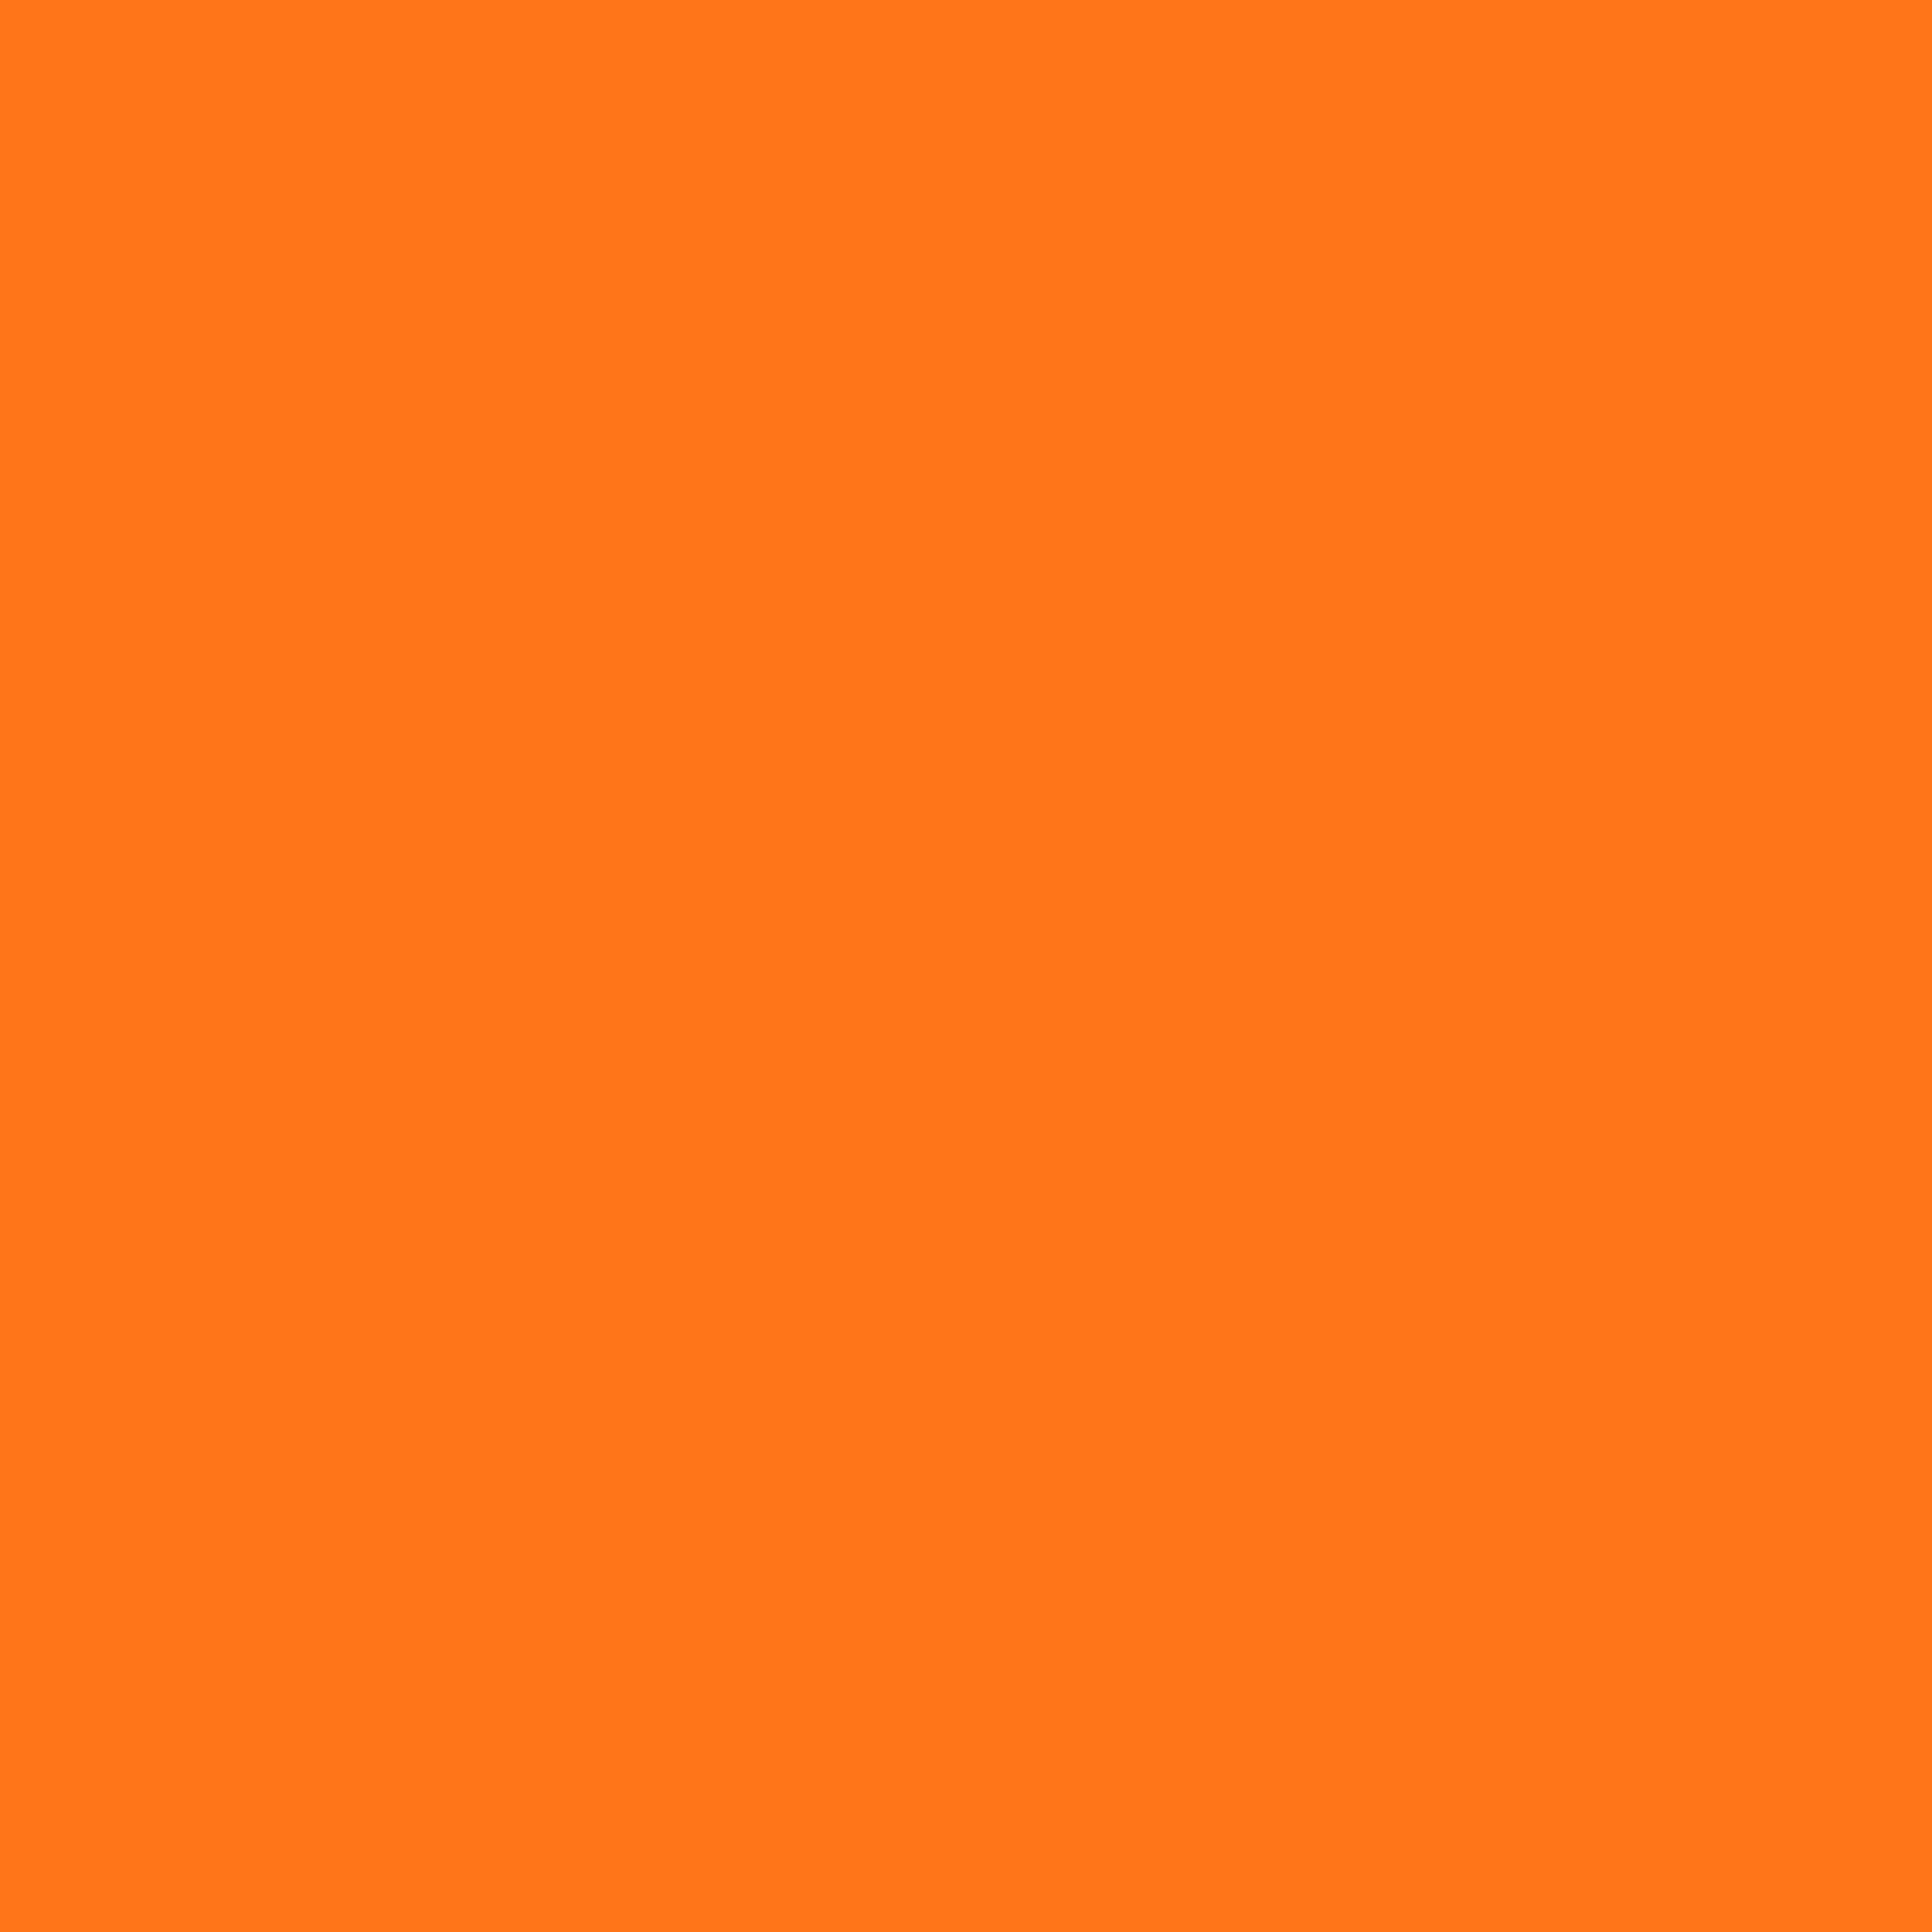 3600x3600 Pumpkin Solid Color Background